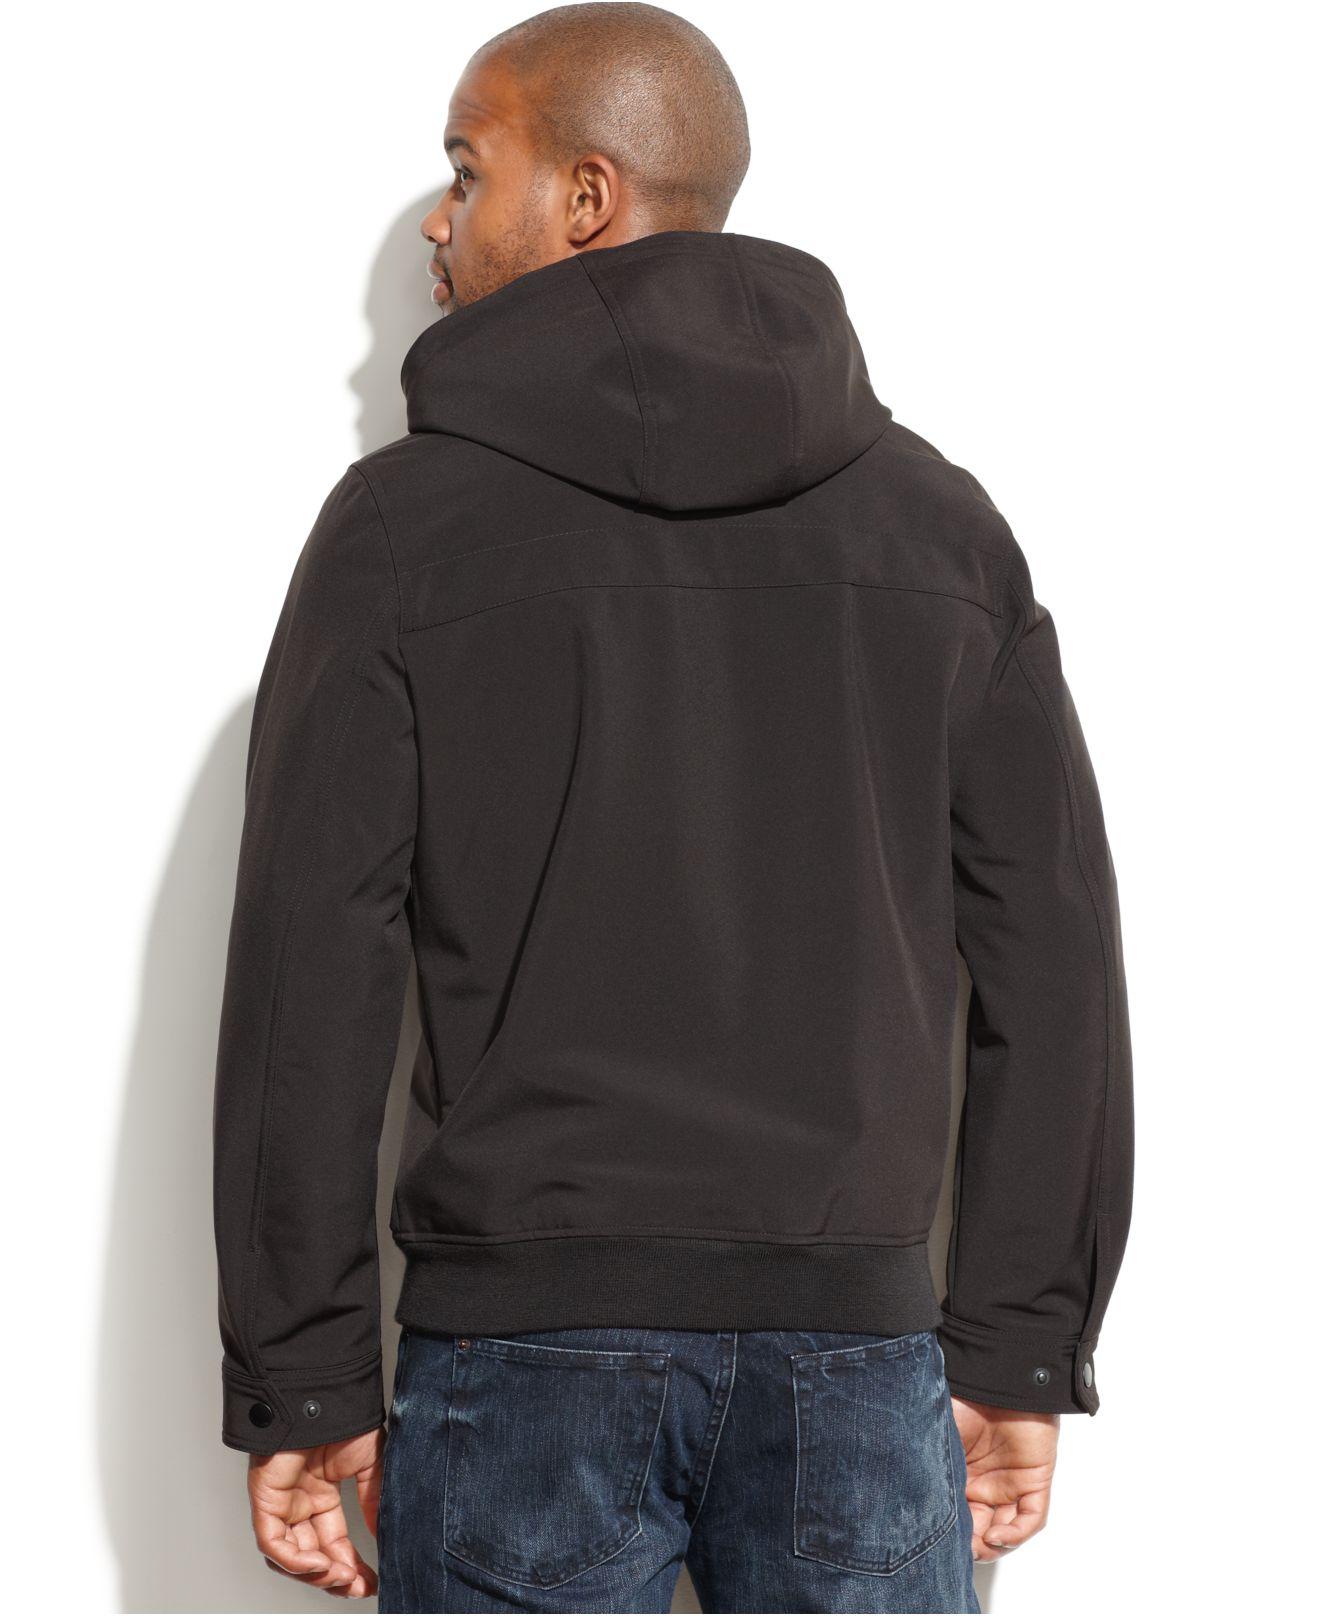 76443b13fec Lyst - Tommy Hilfiger Hooded Soft-shell Jacket In Black For Men